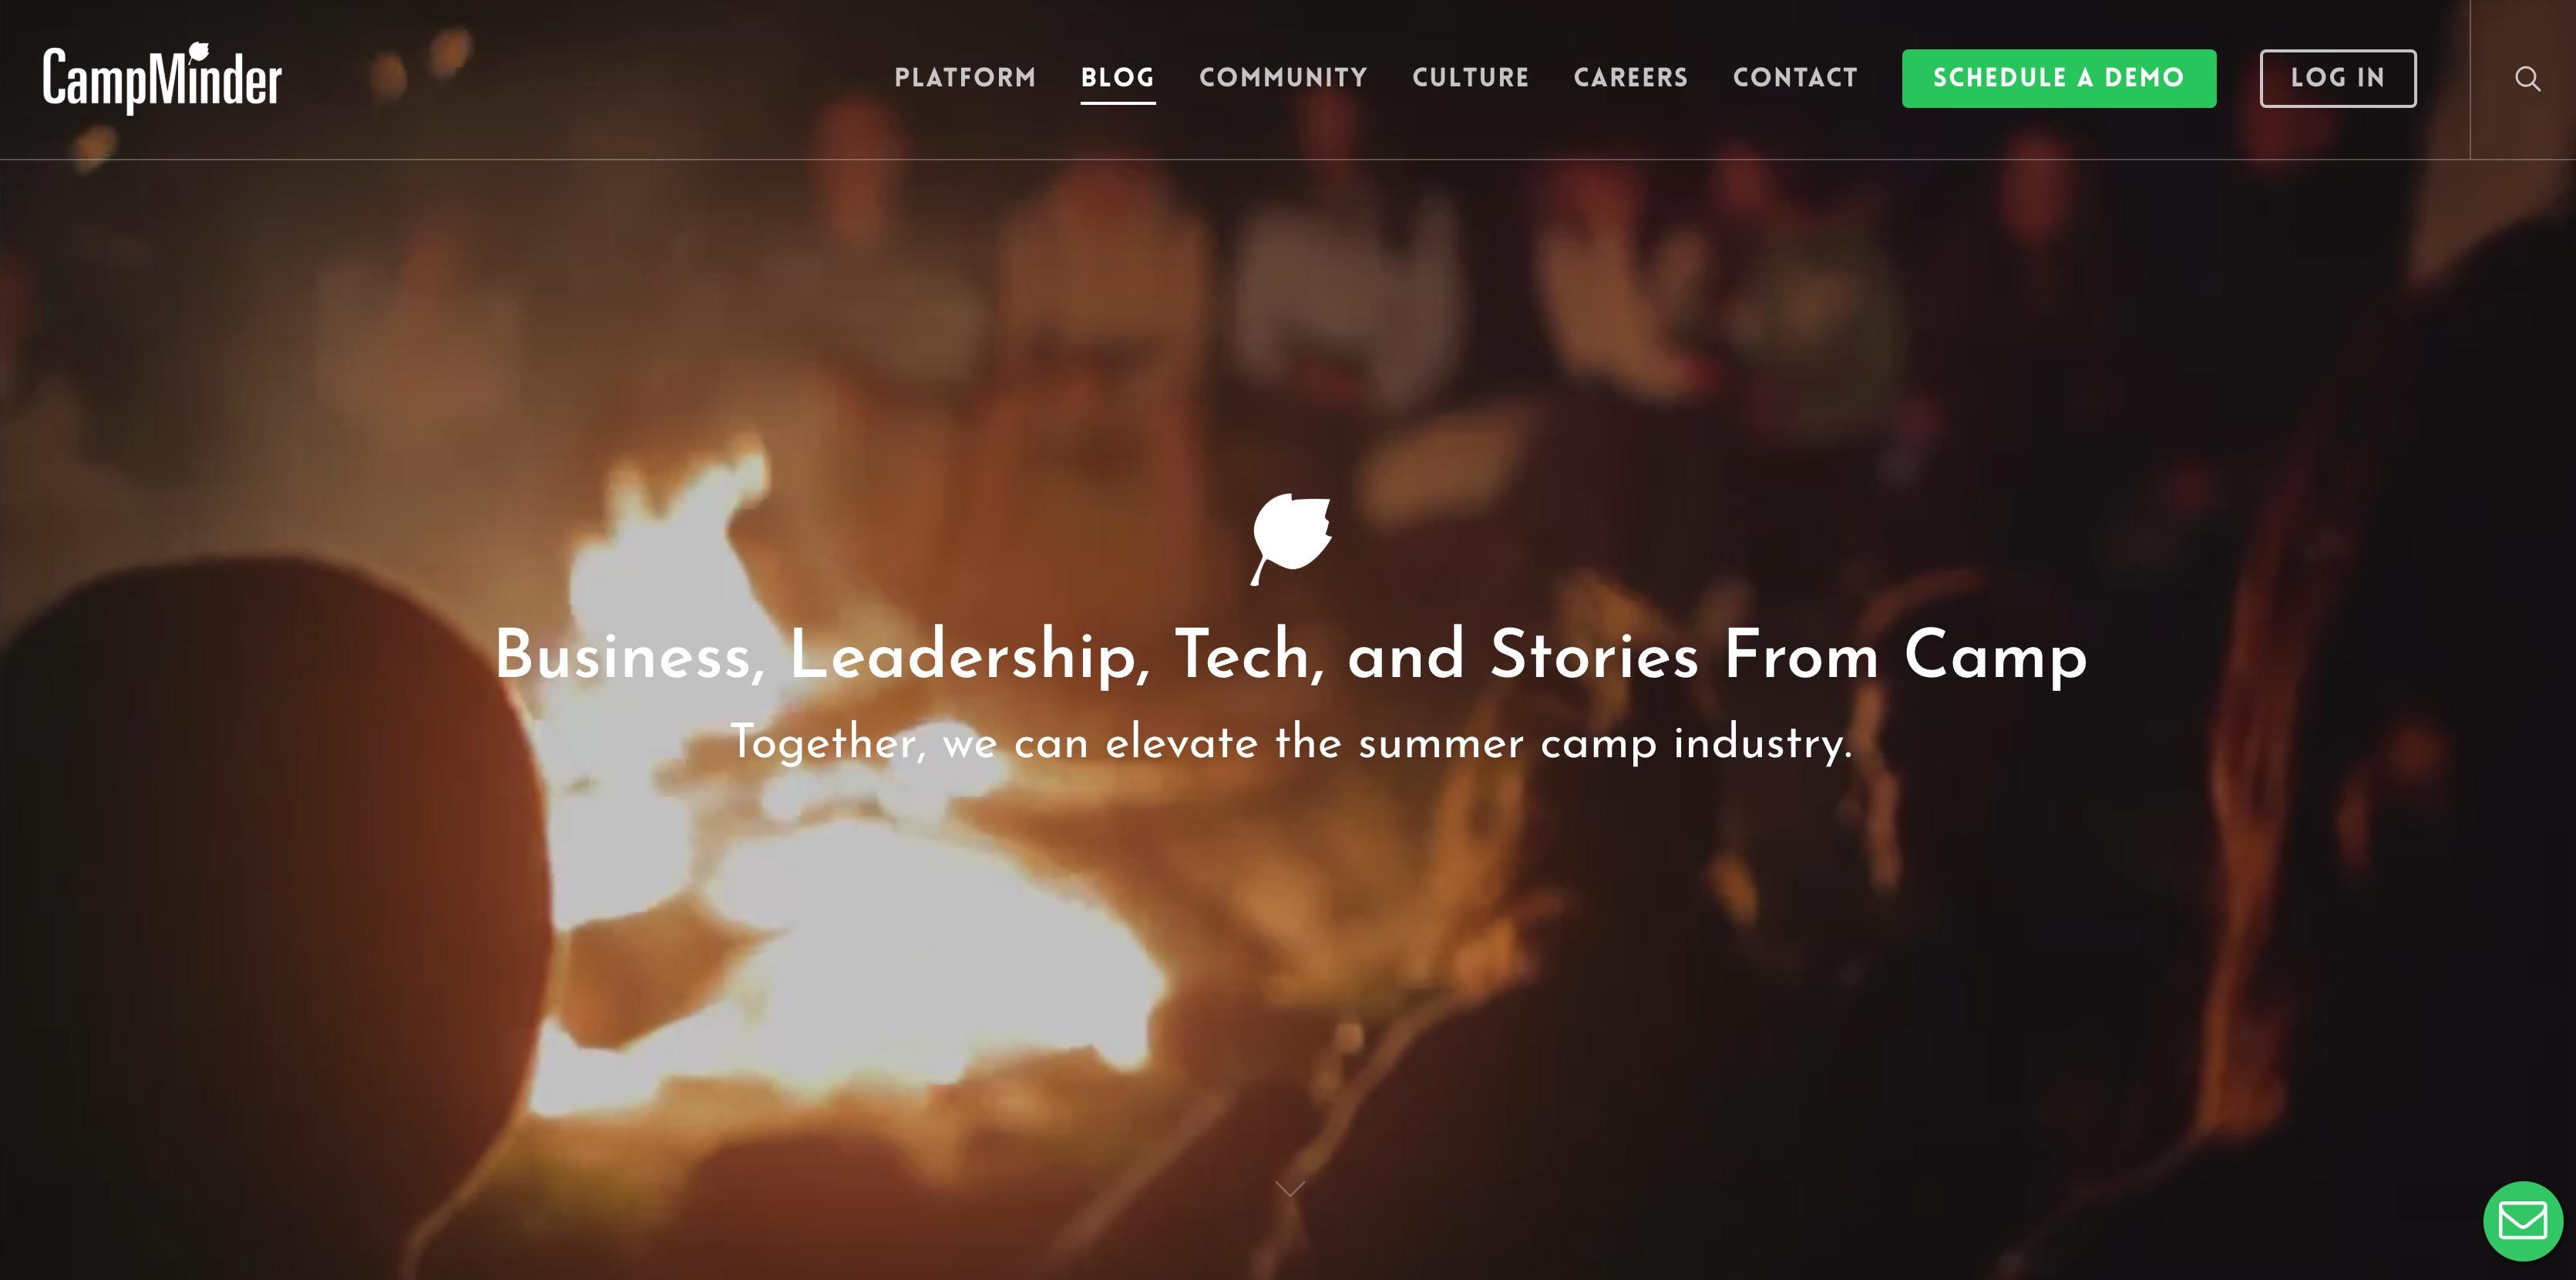 CampMinder Demo - Welcome to the CampMinder Summer Camp Blog